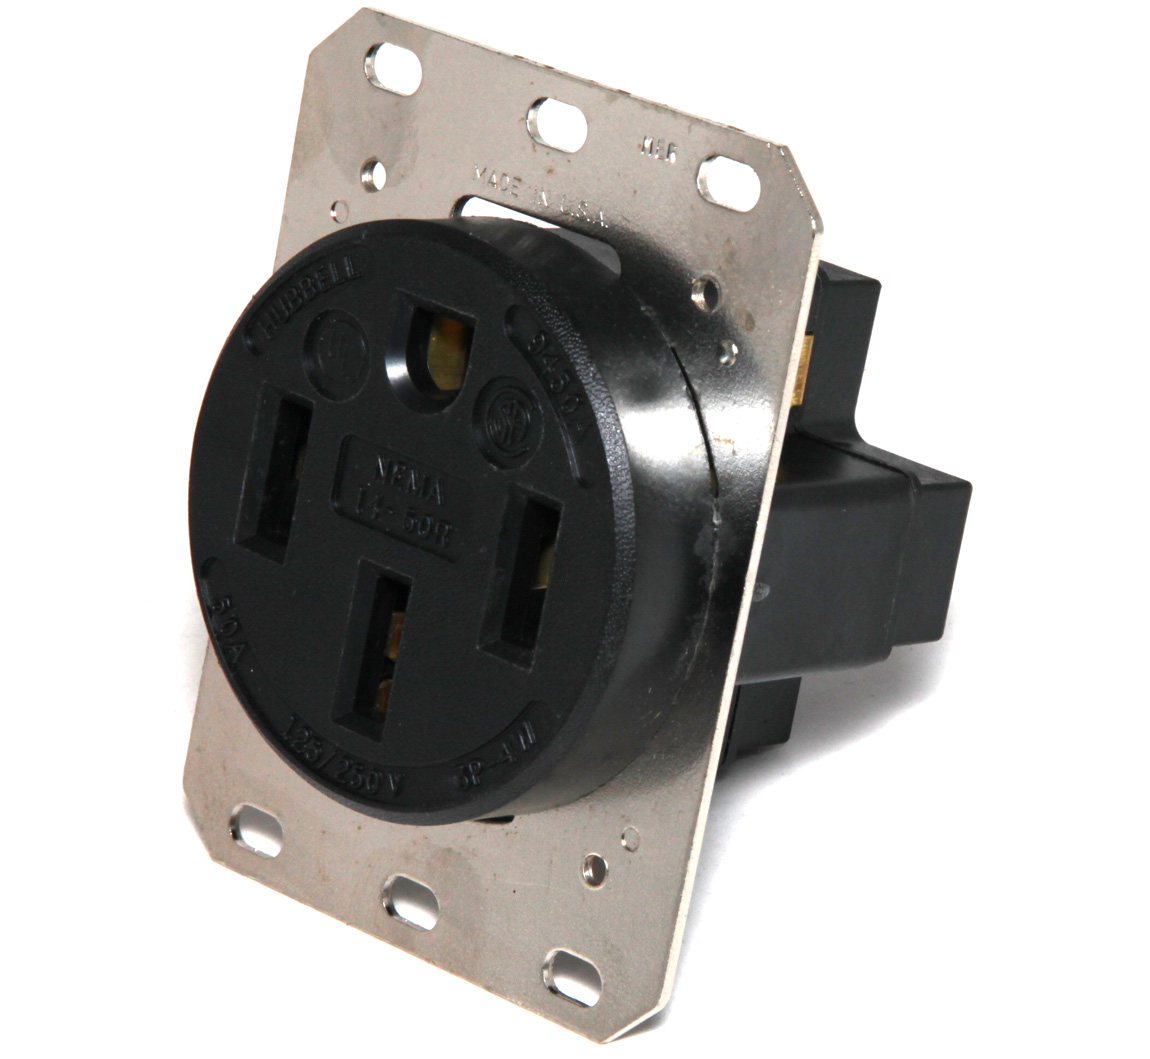 Hubbell Hbl9450a 3